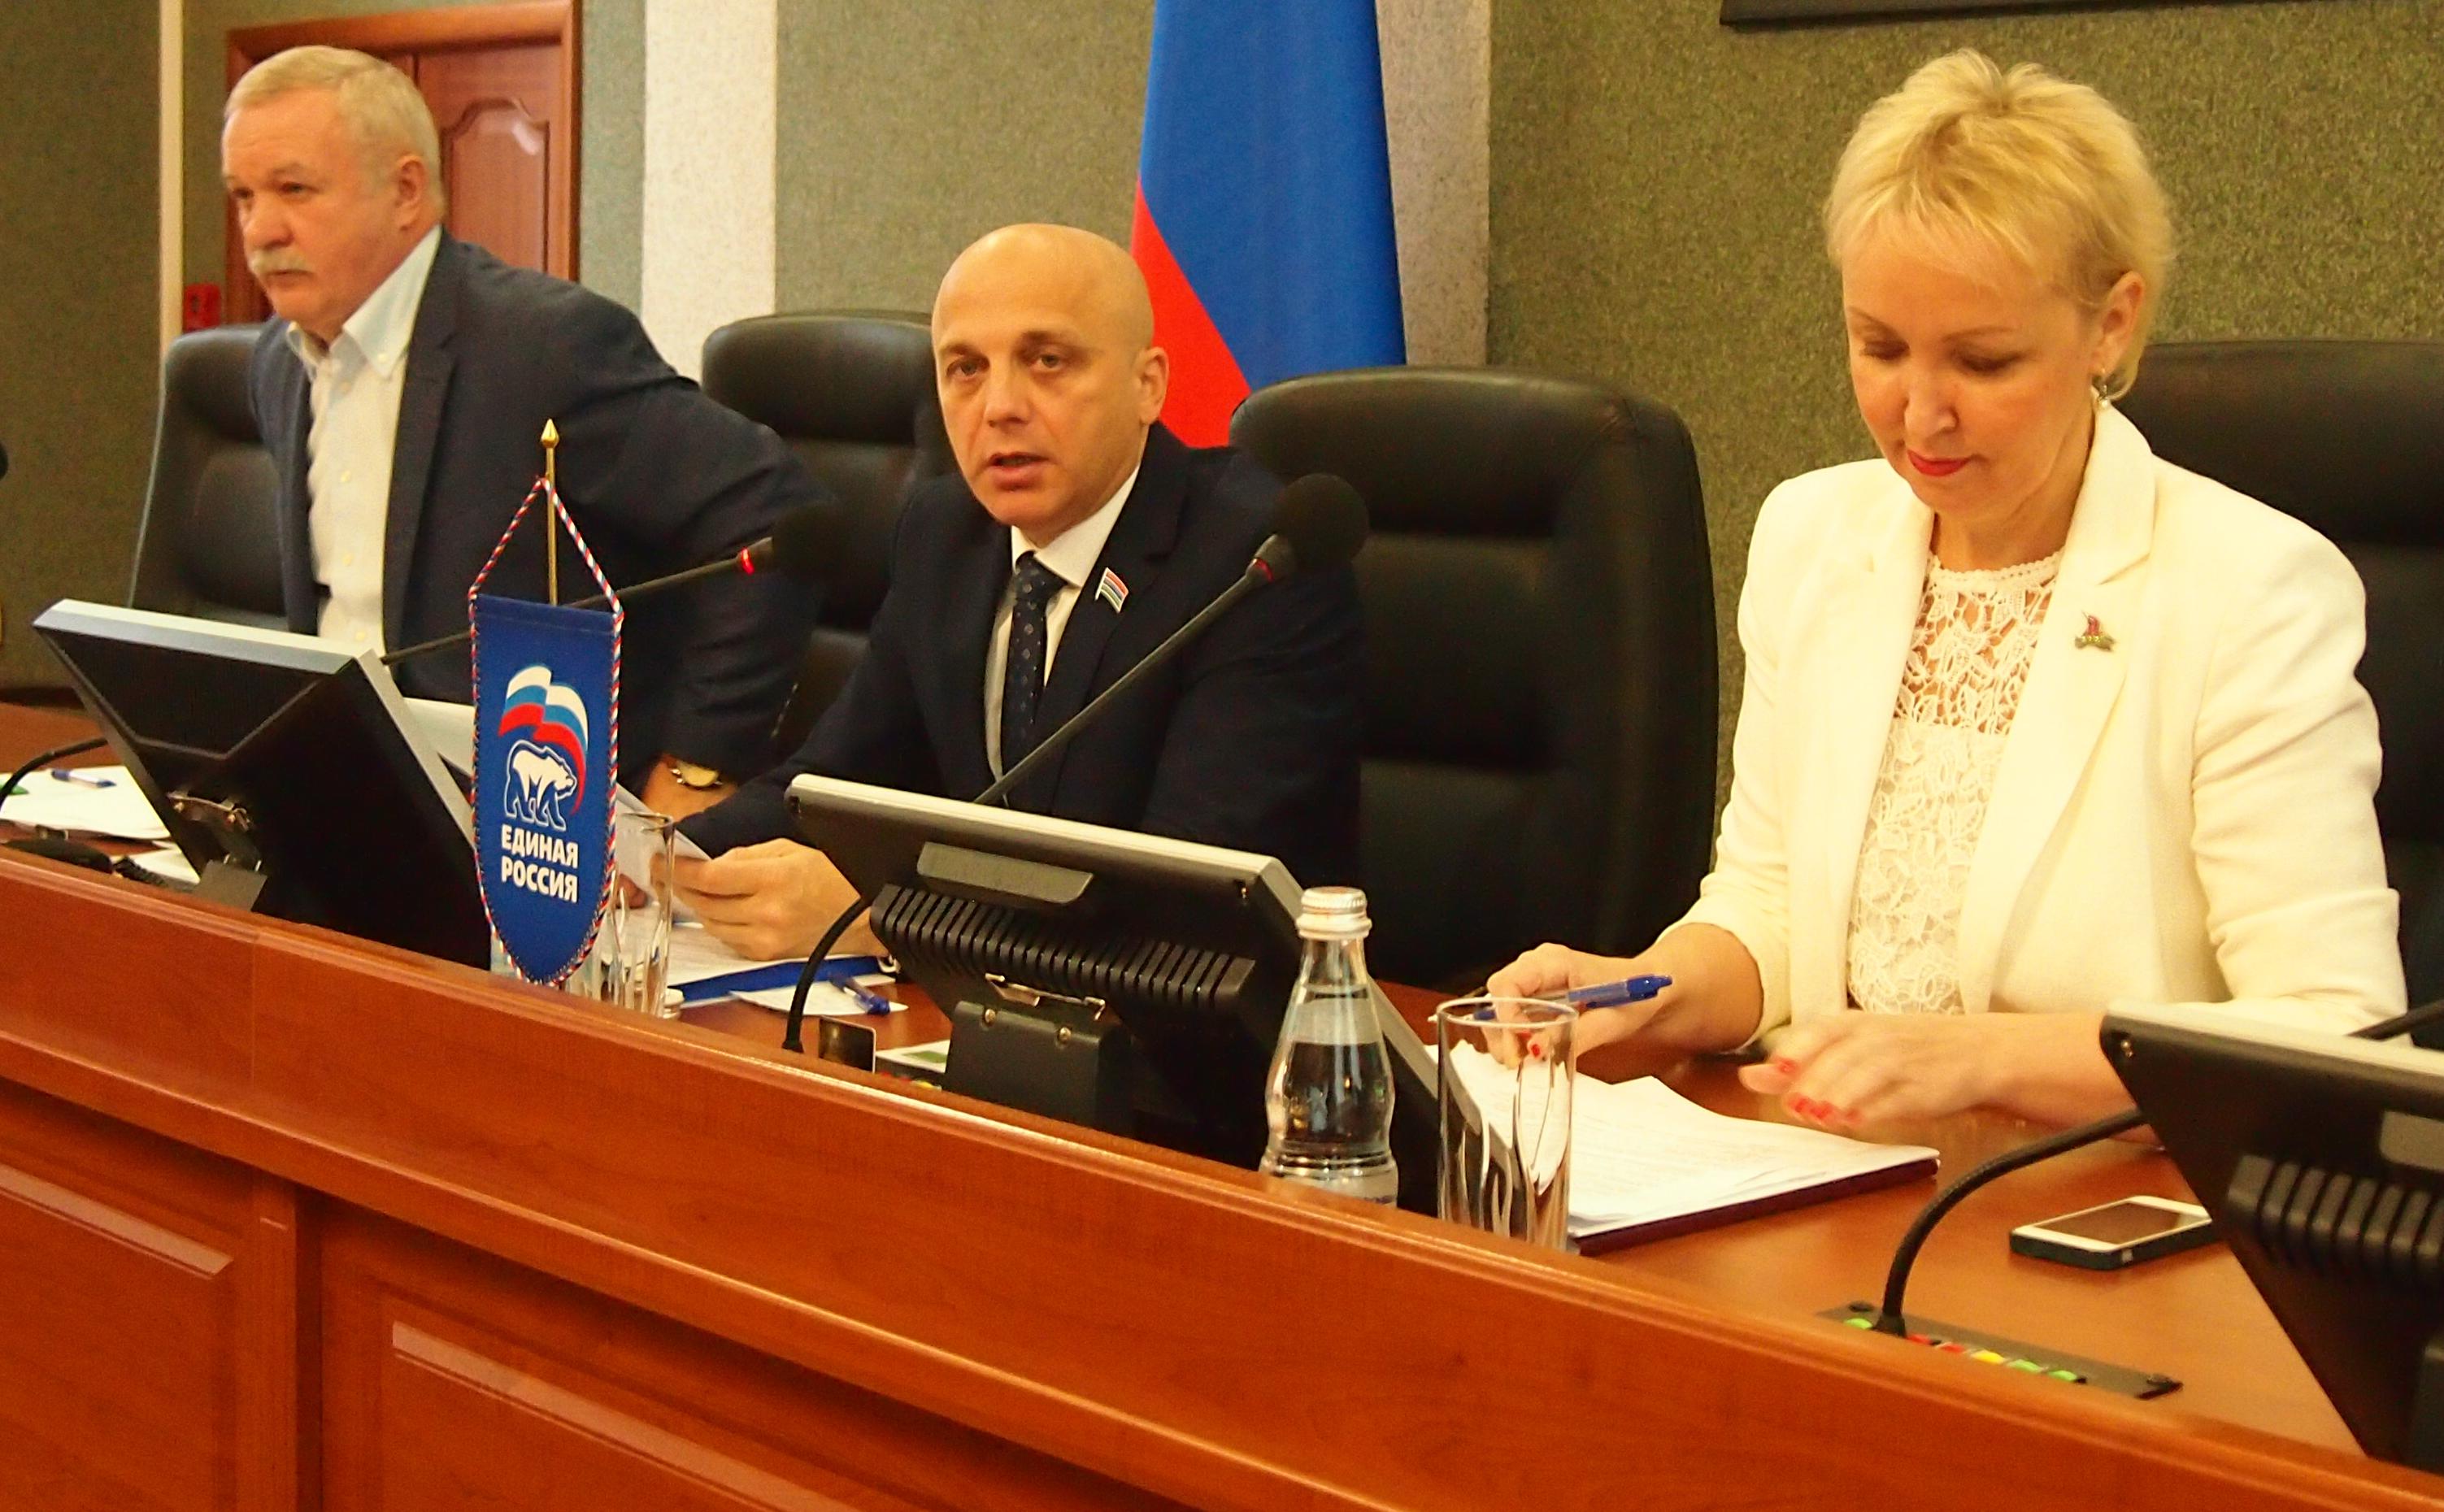 Руководство нового карельского парламента. Фото: Валерий Поташов